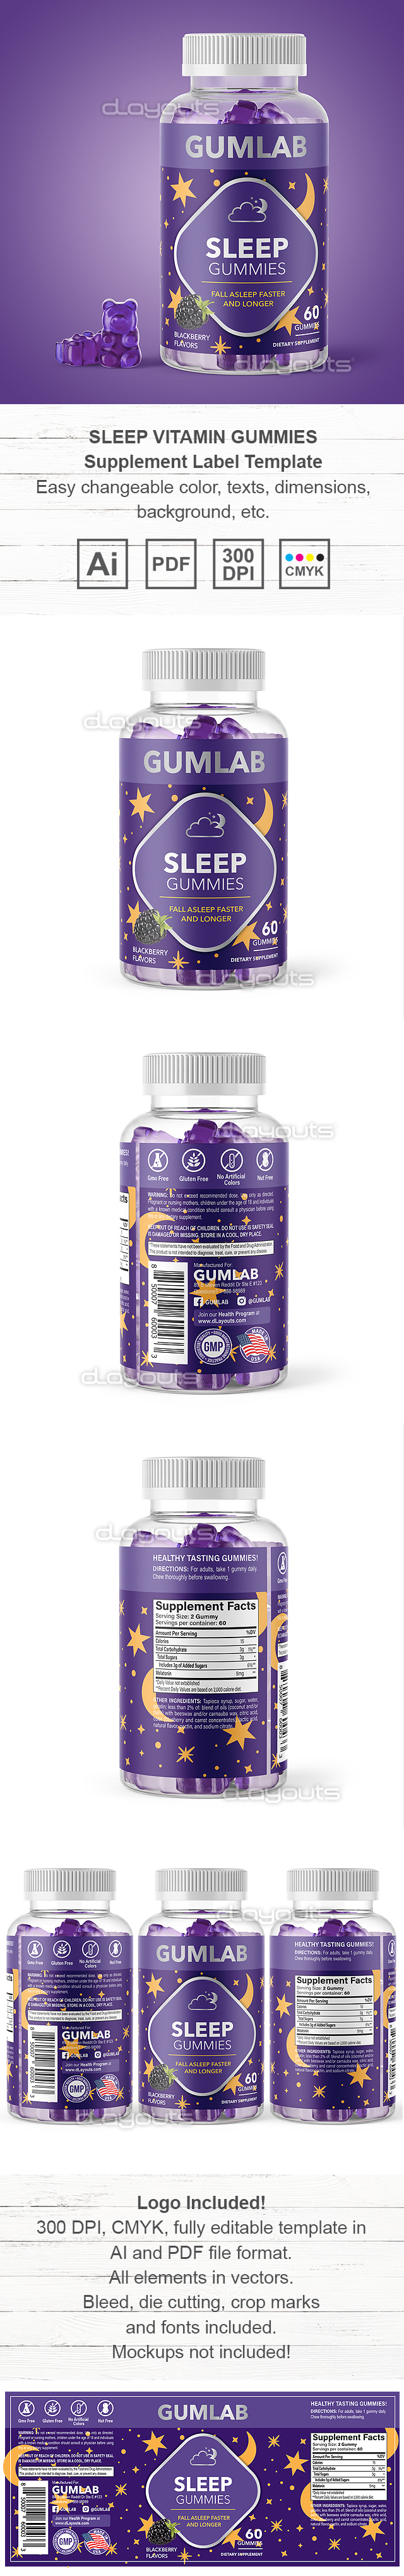 Sleep Vitamin Gummies Supplement Label Template